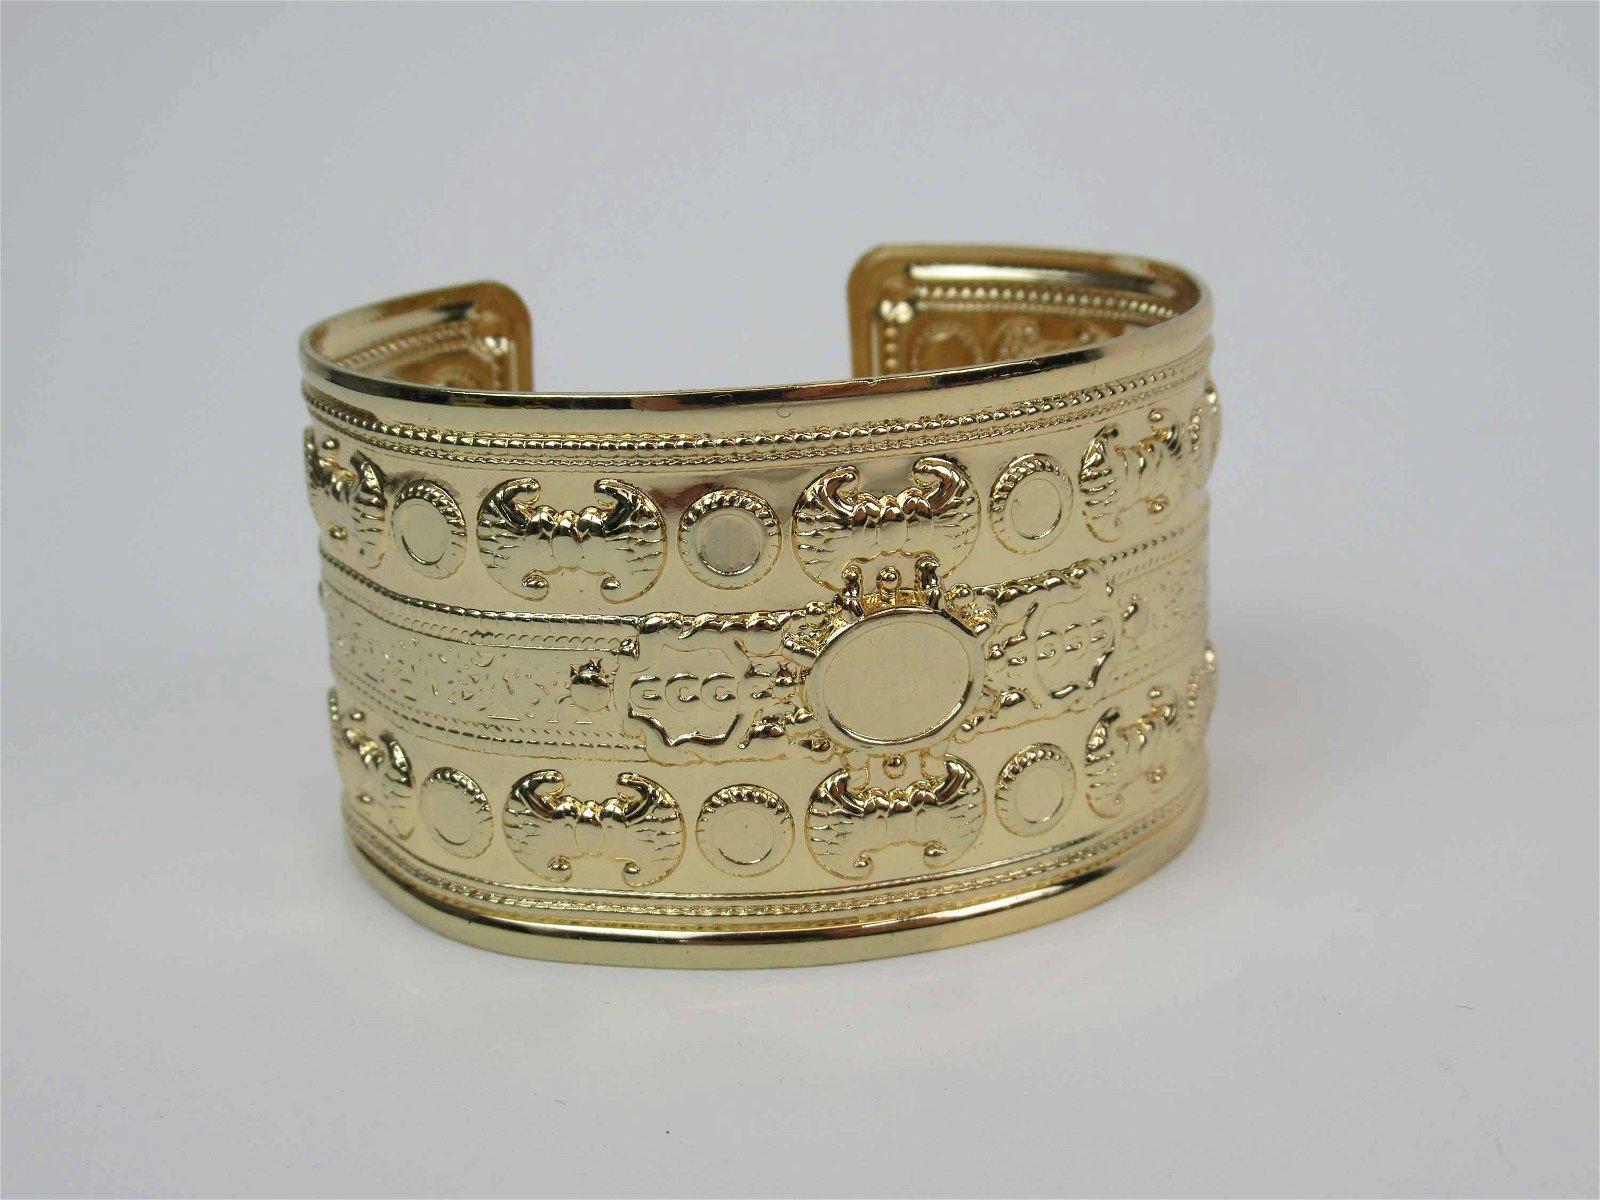 Victorian Style Pressed Metal Wide Cuff Bracelet